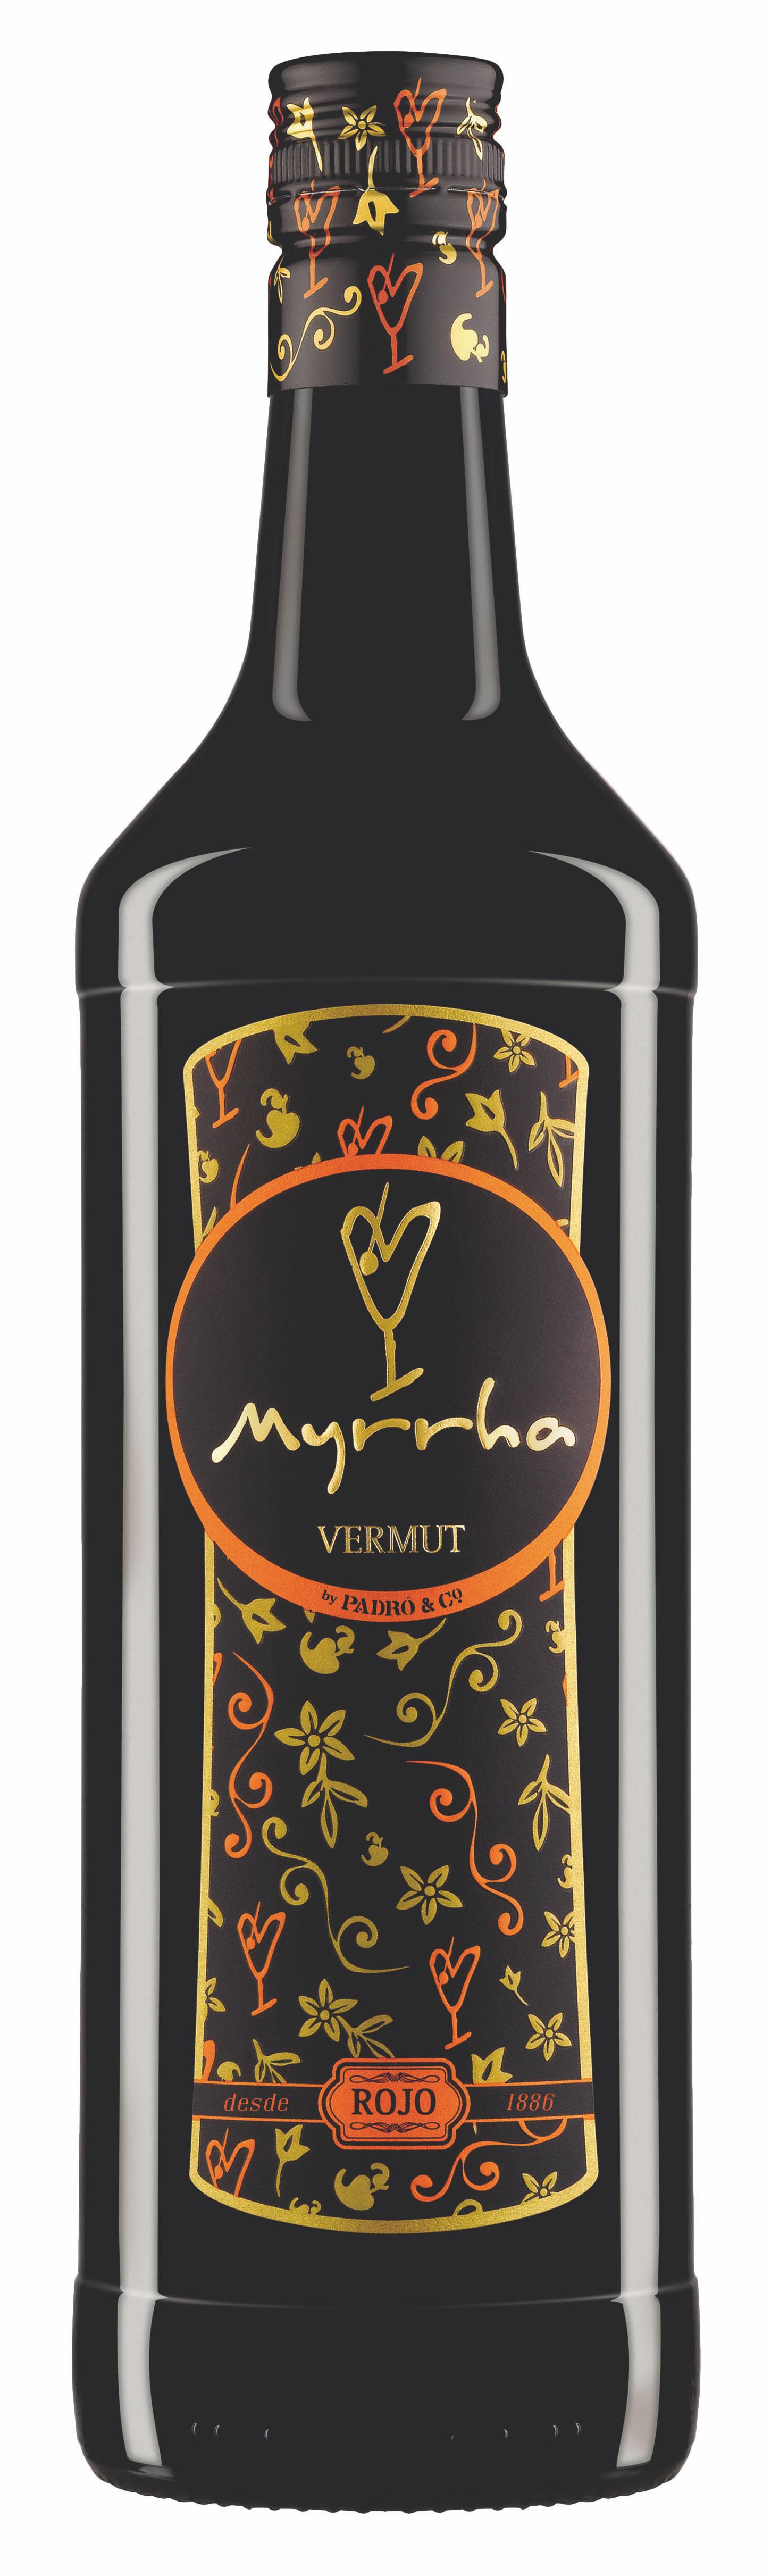 Myrrha Rojo | Padró & Co.  - Winexfood